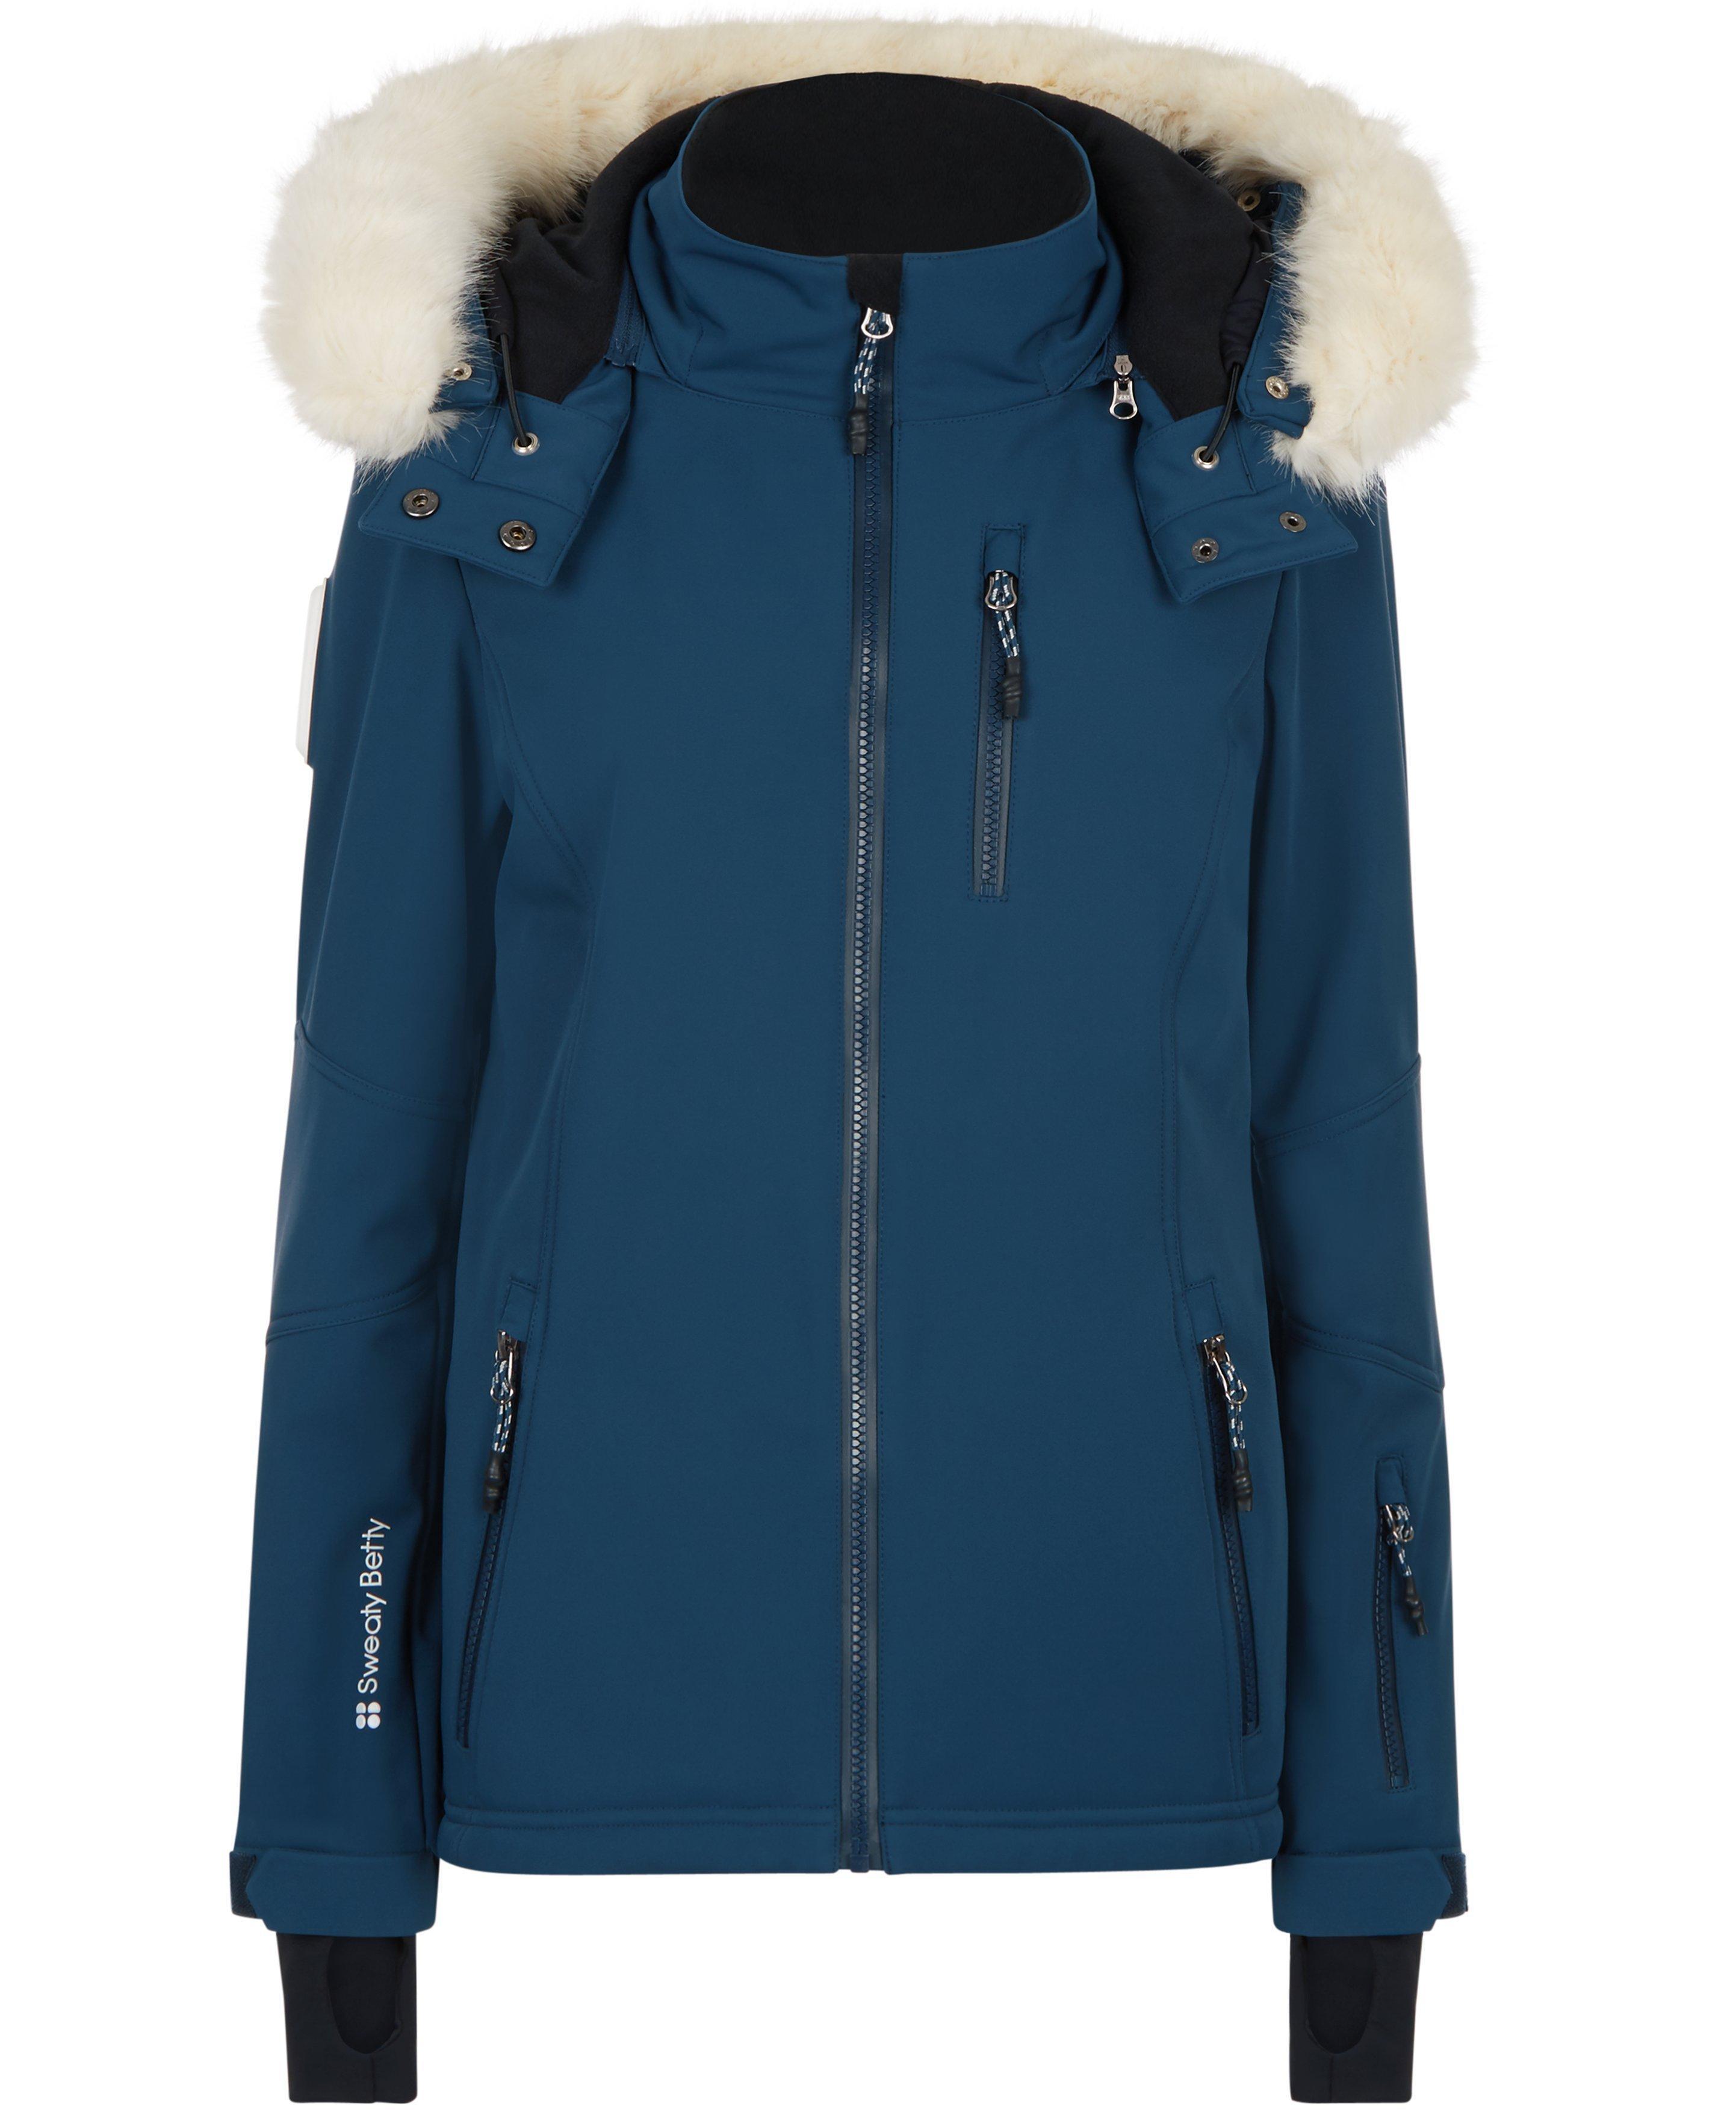 b8d0221305e Exploration Softshell Ski Jacket